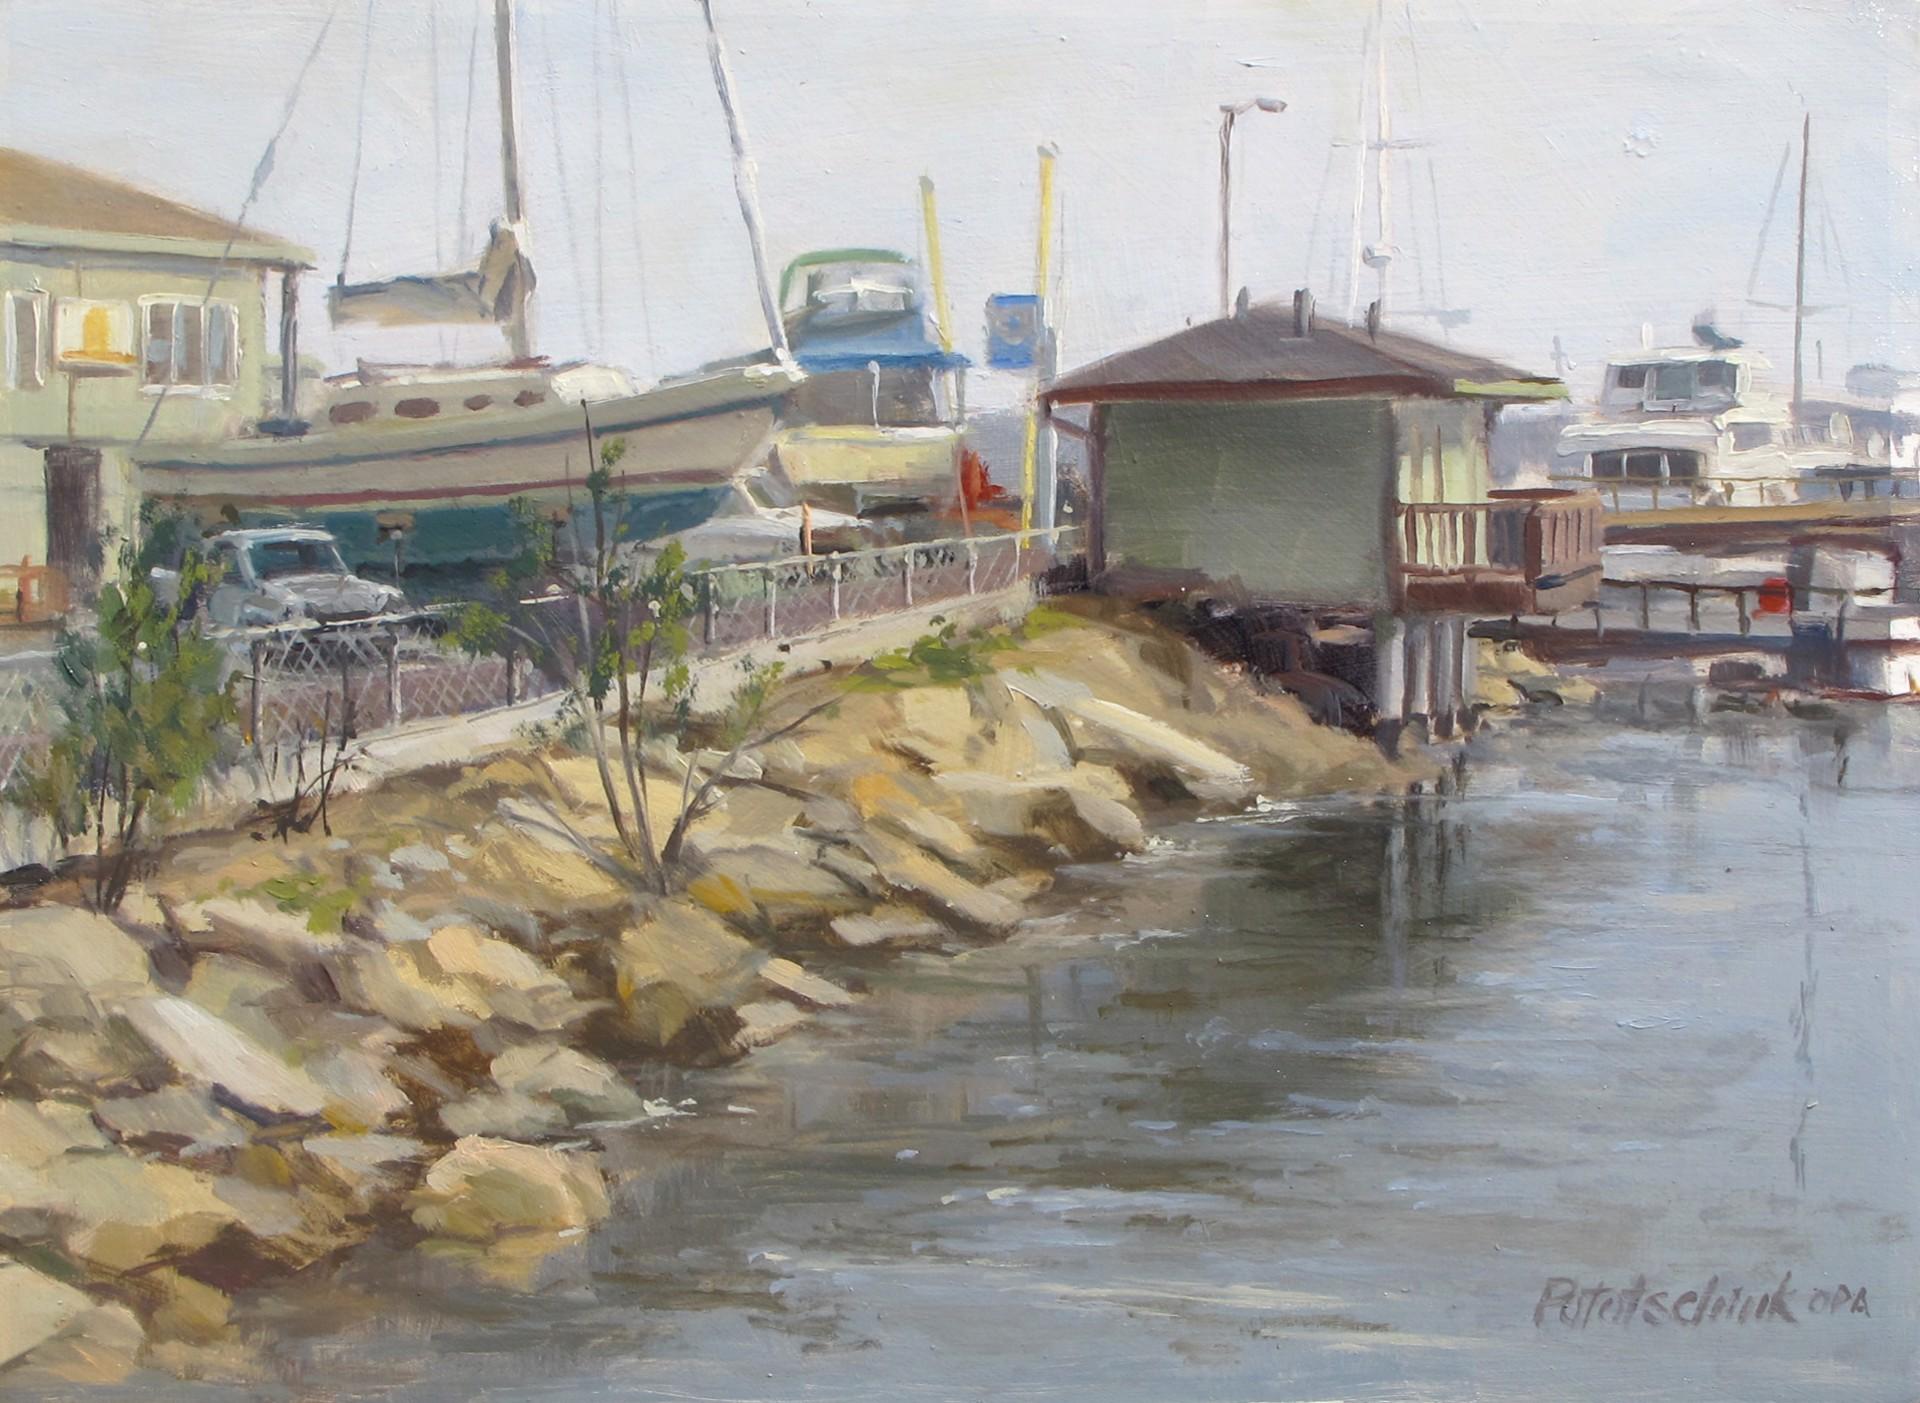 On the Dock of the Bay by John Pototschnik